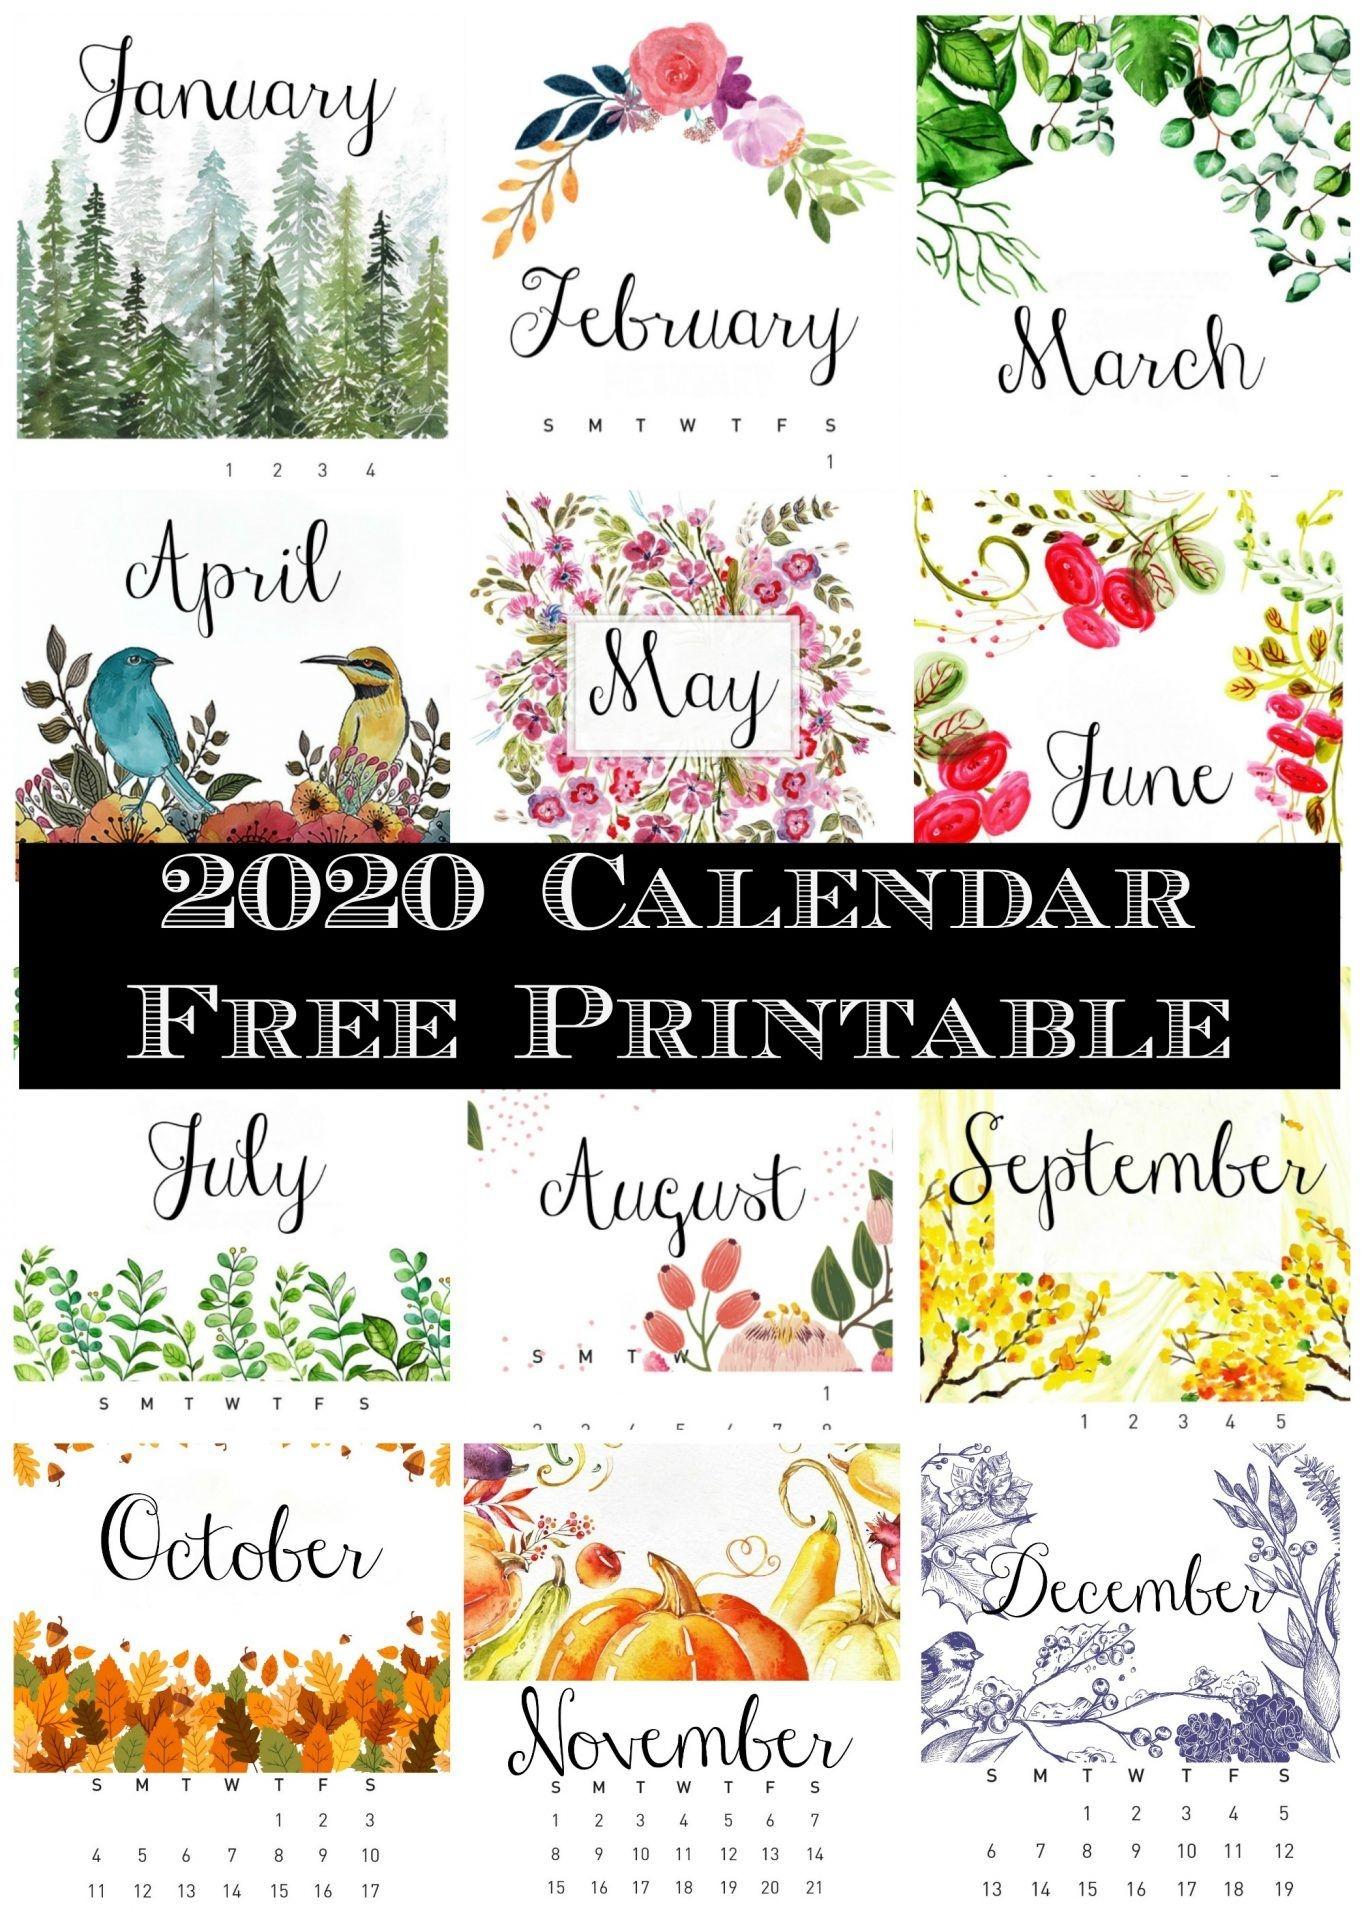 Free Printable 2020 Calendar - 2 Bees In A Pod